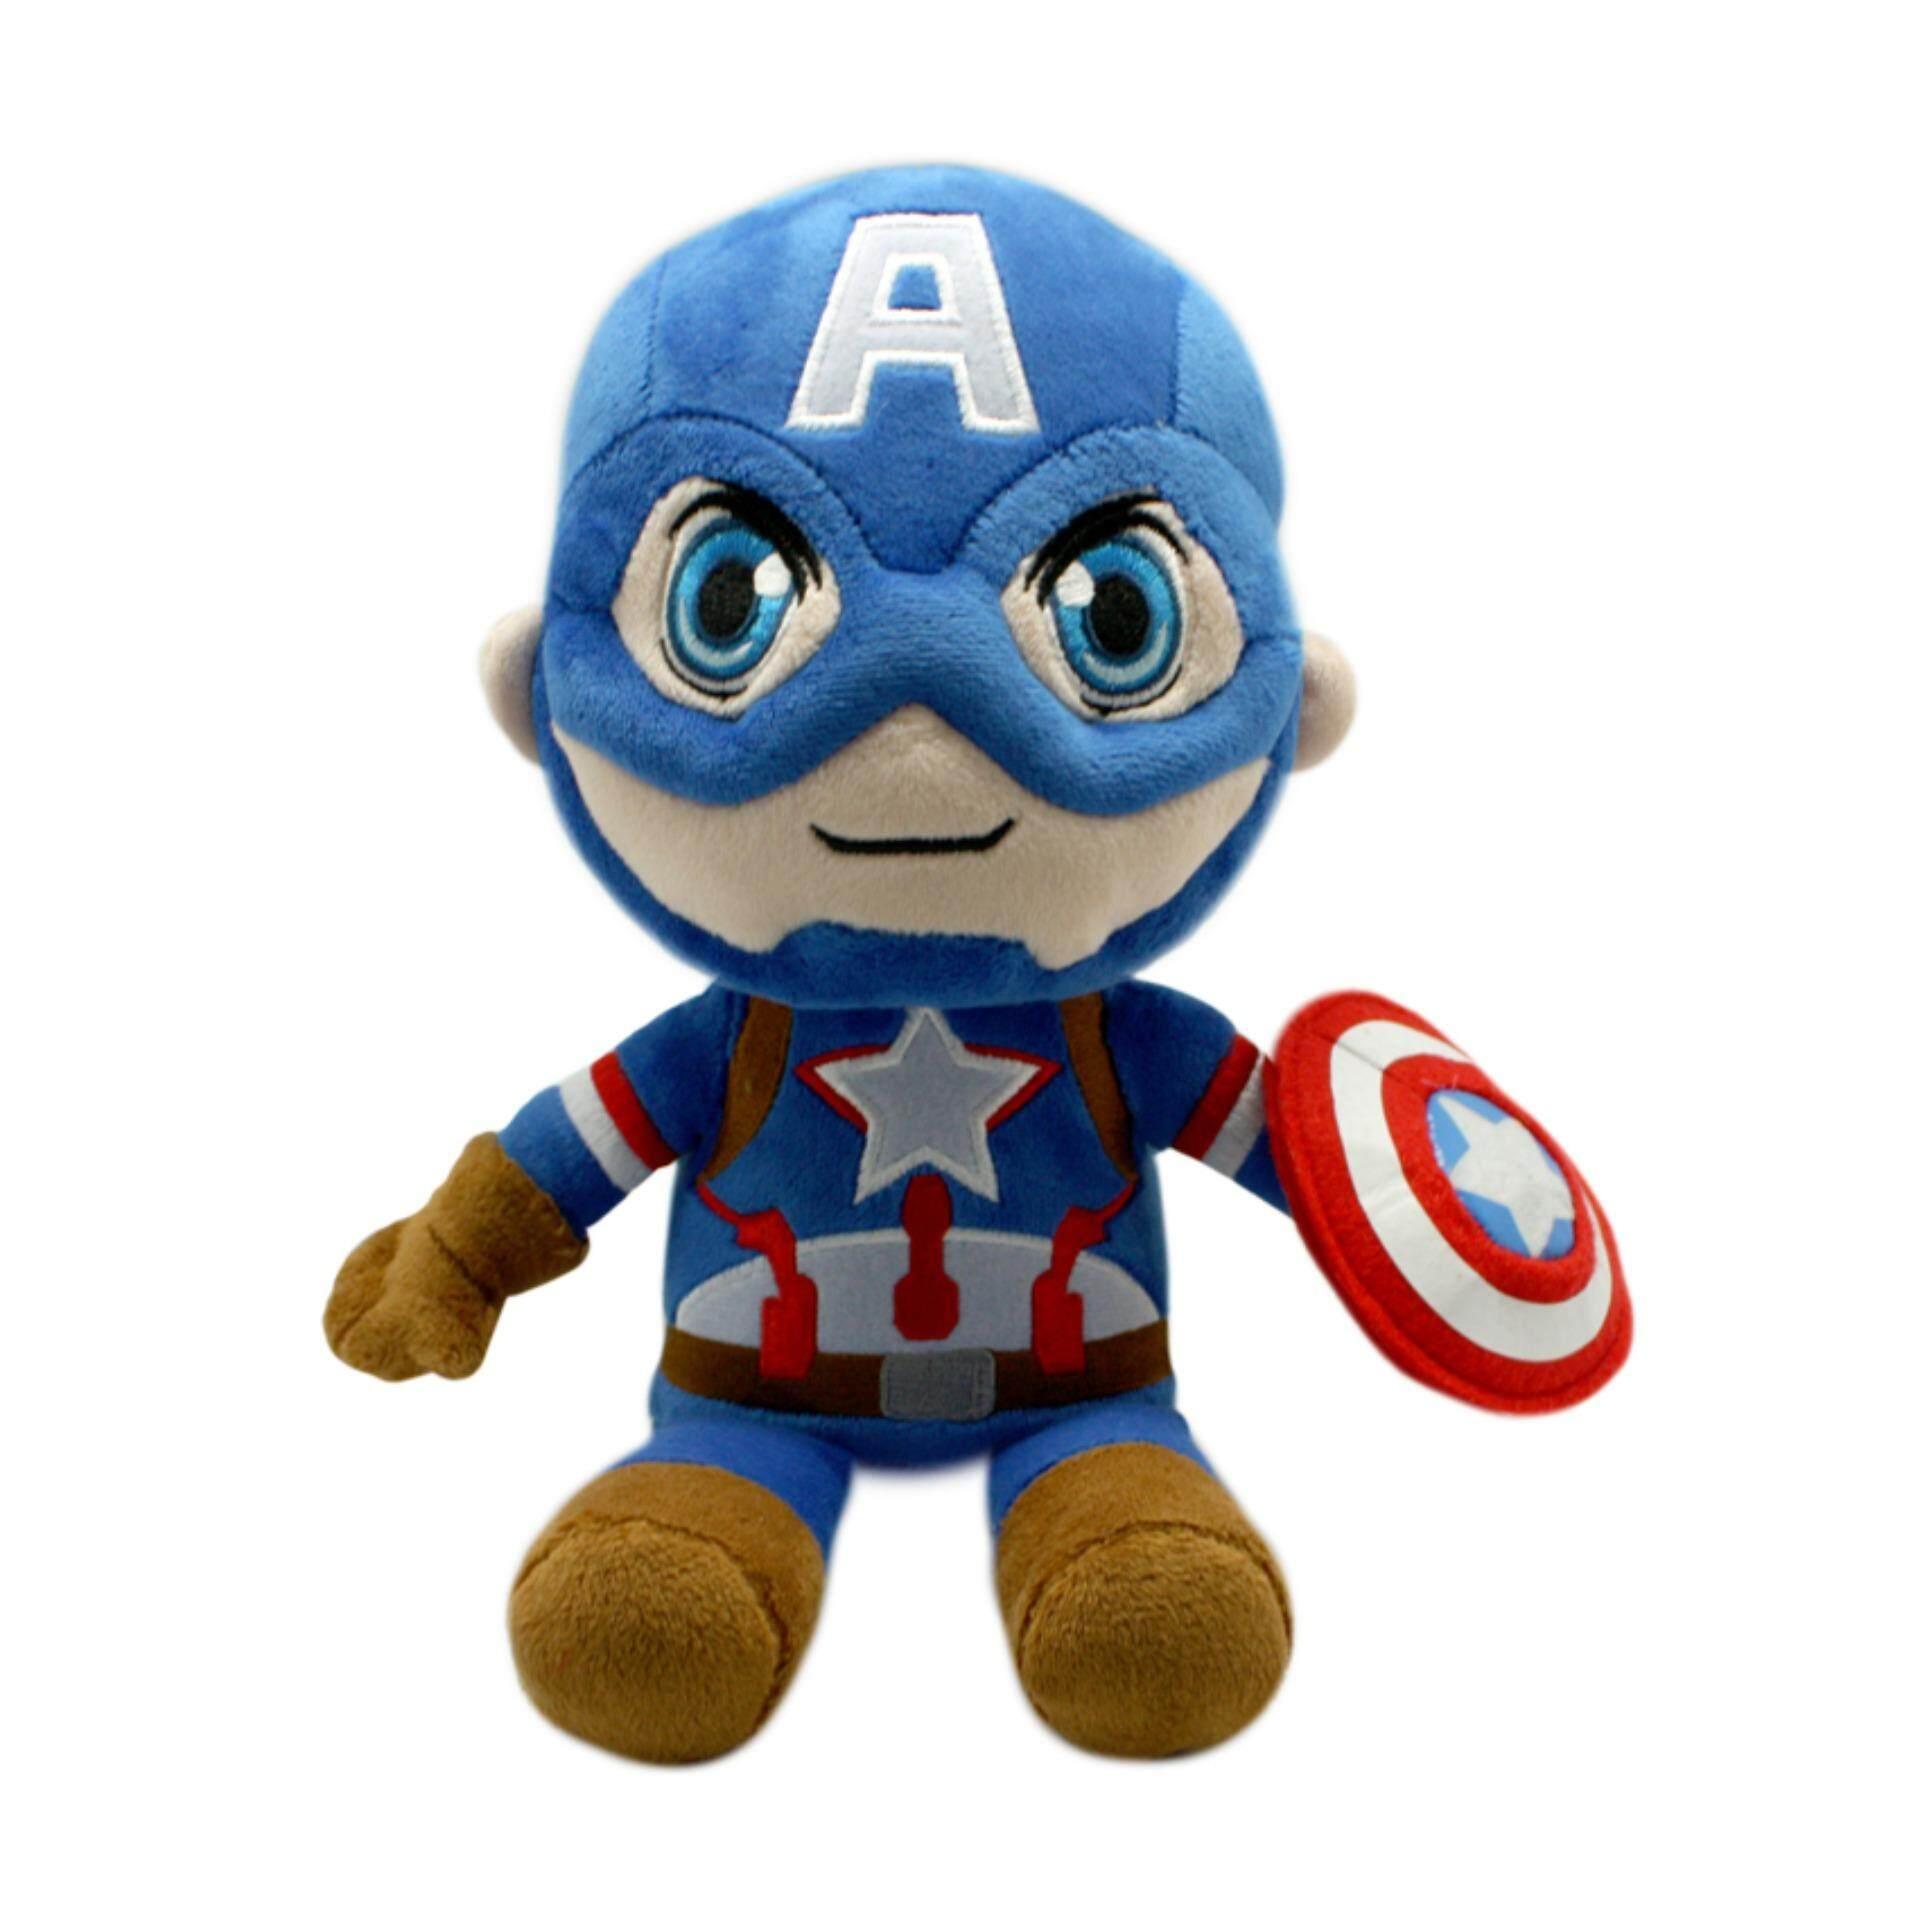 Marvel Avengers Standard Captain America Plush Toys 10 Inches - Multicolour